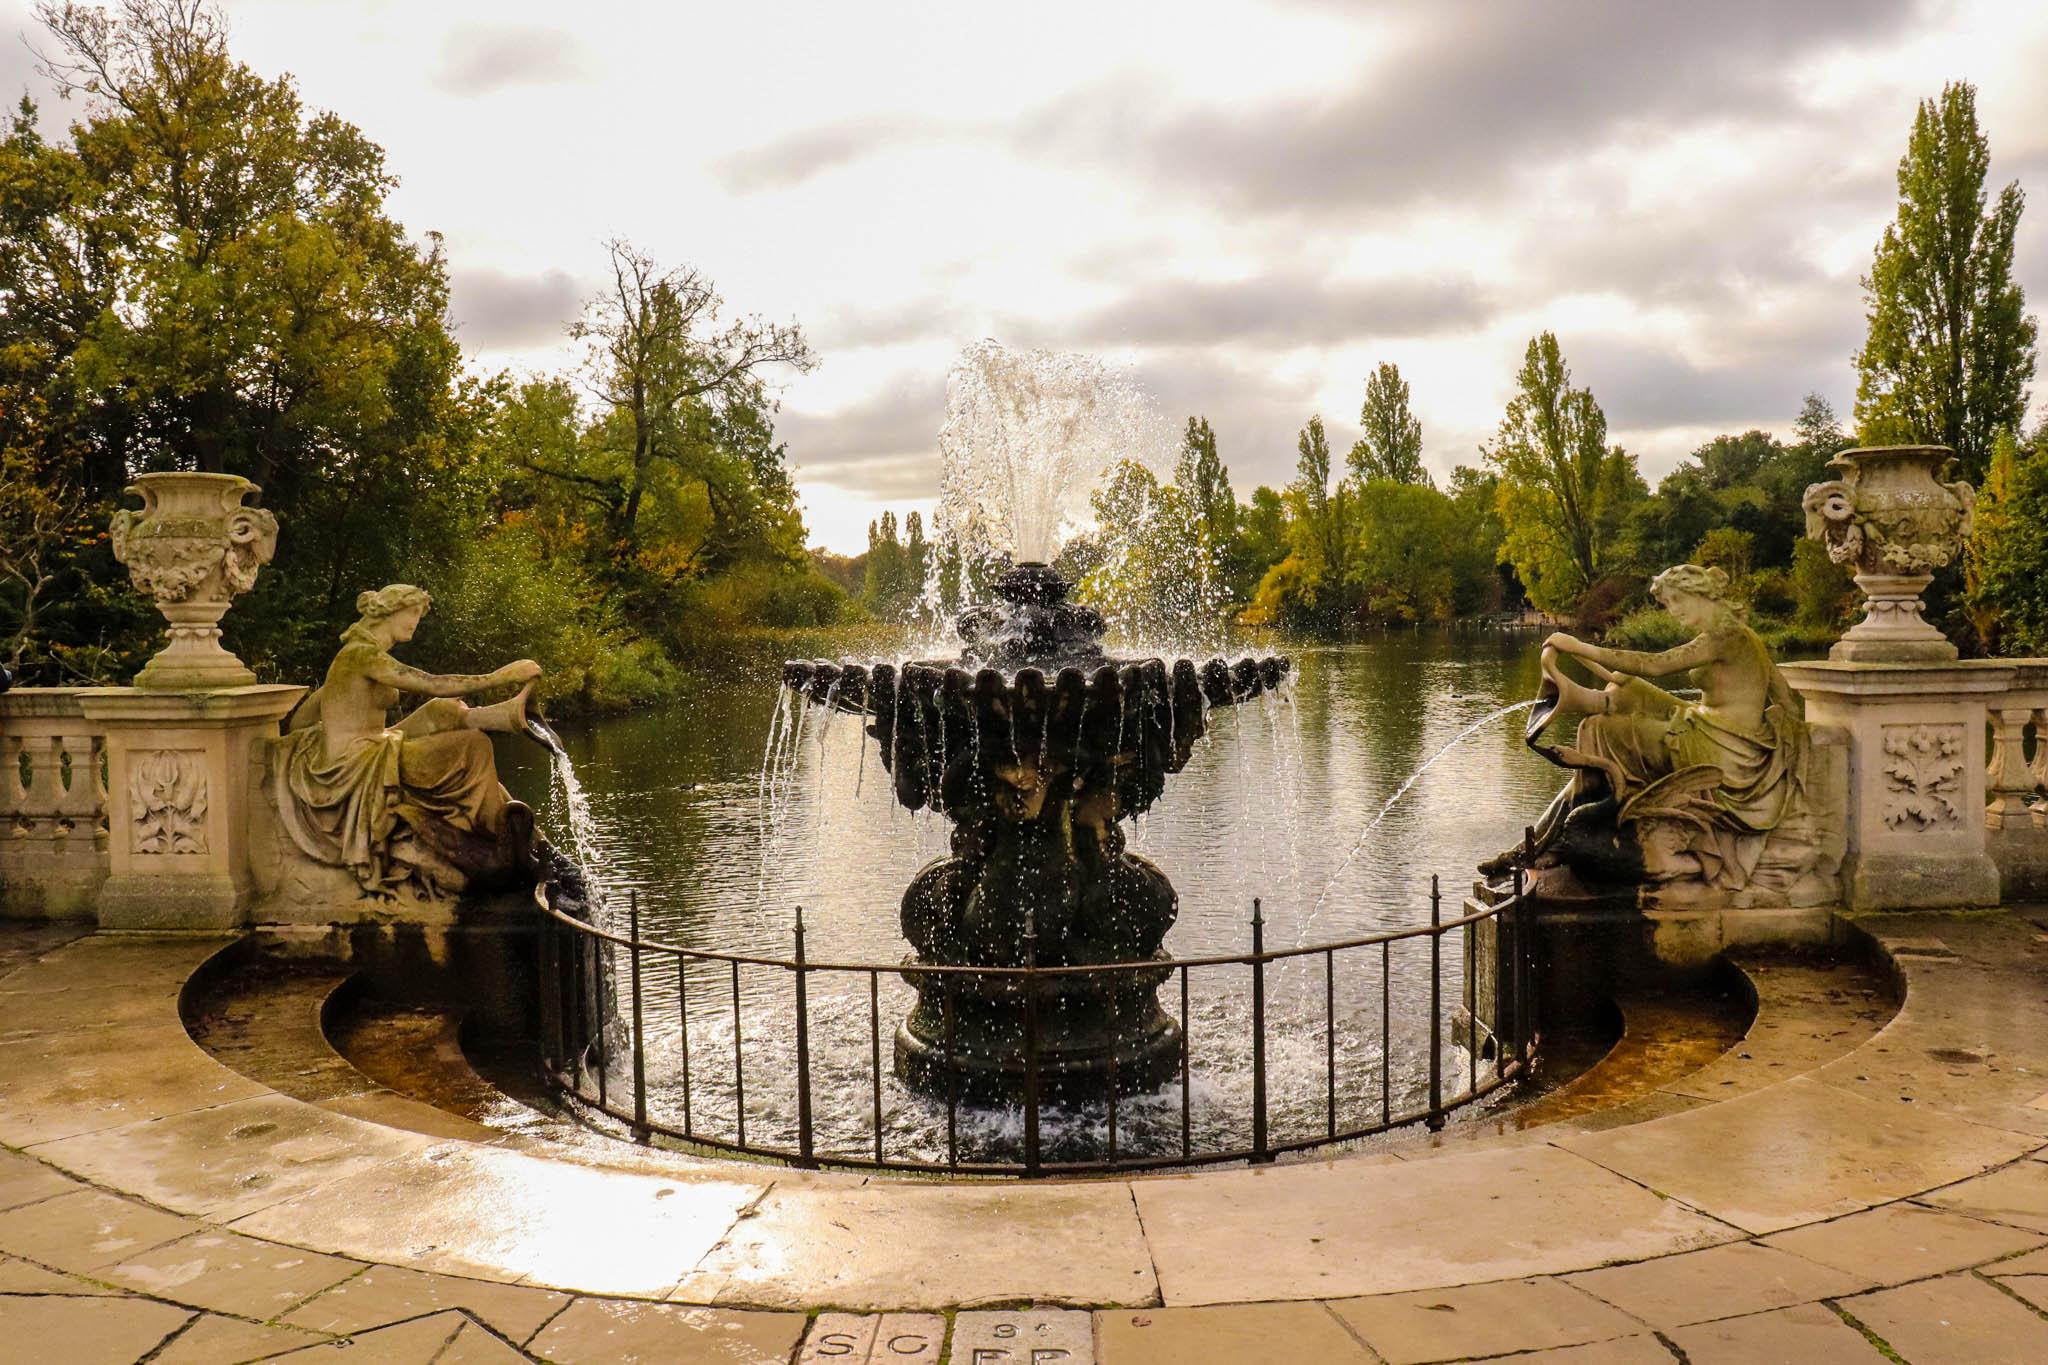 Italian Gardens, Kensington Gardens